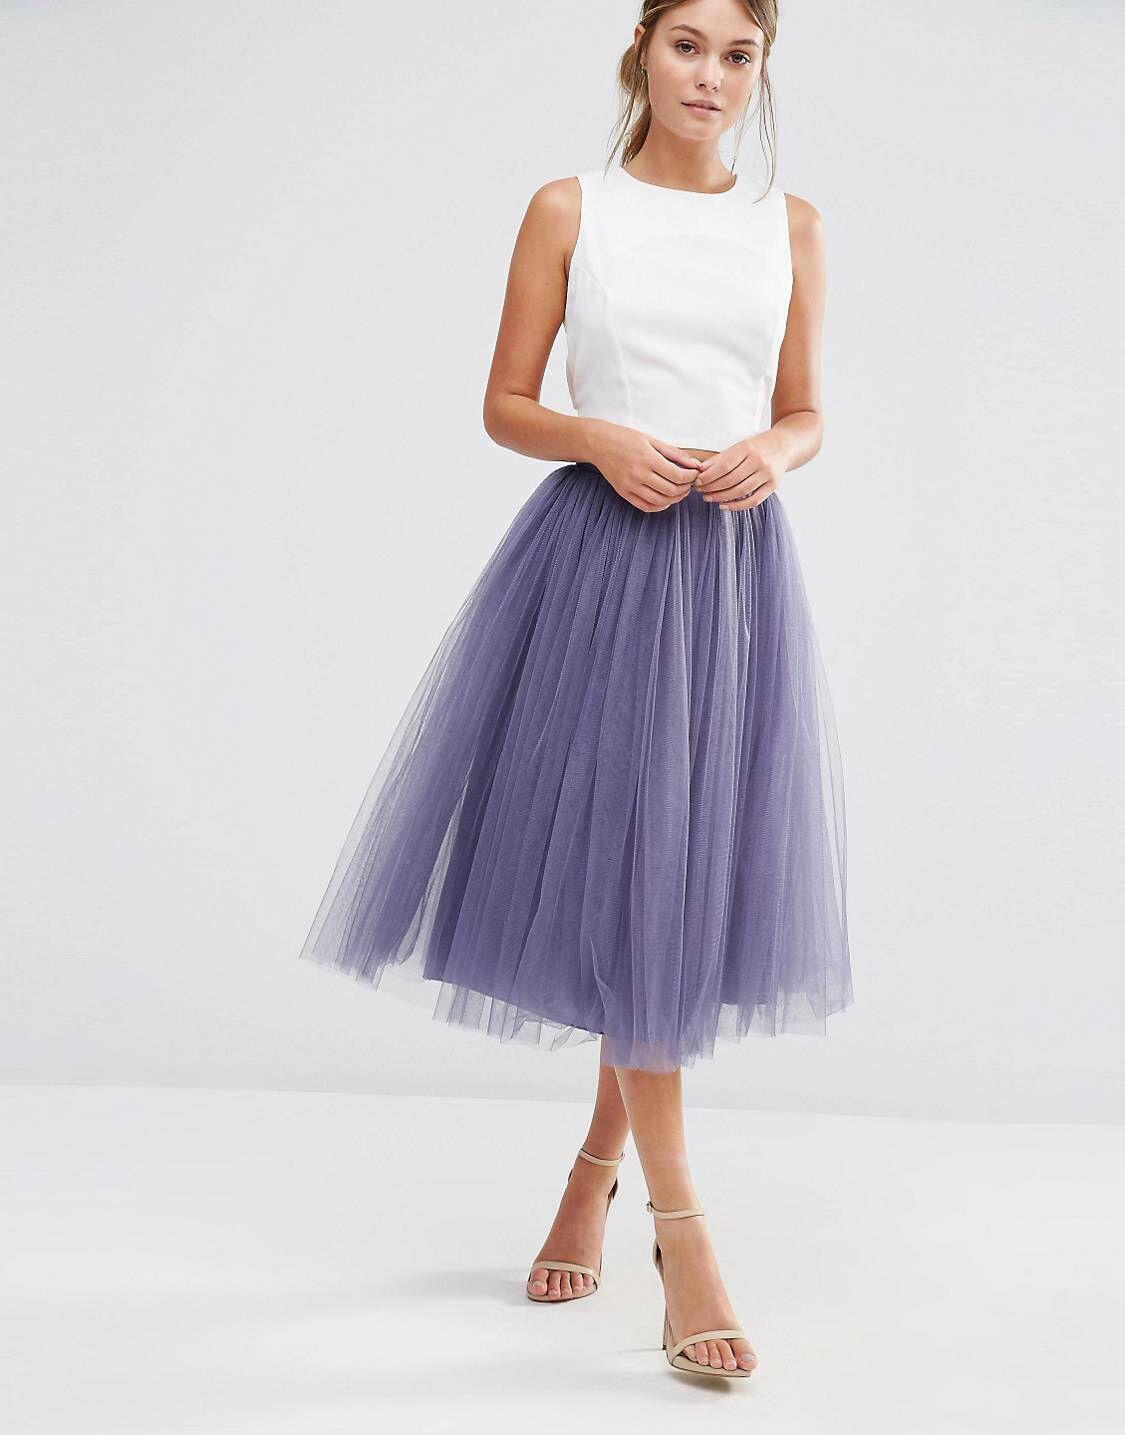 Little Mistress Tulle Midi Prom Skirt in 2019  e54b9fa5e6d